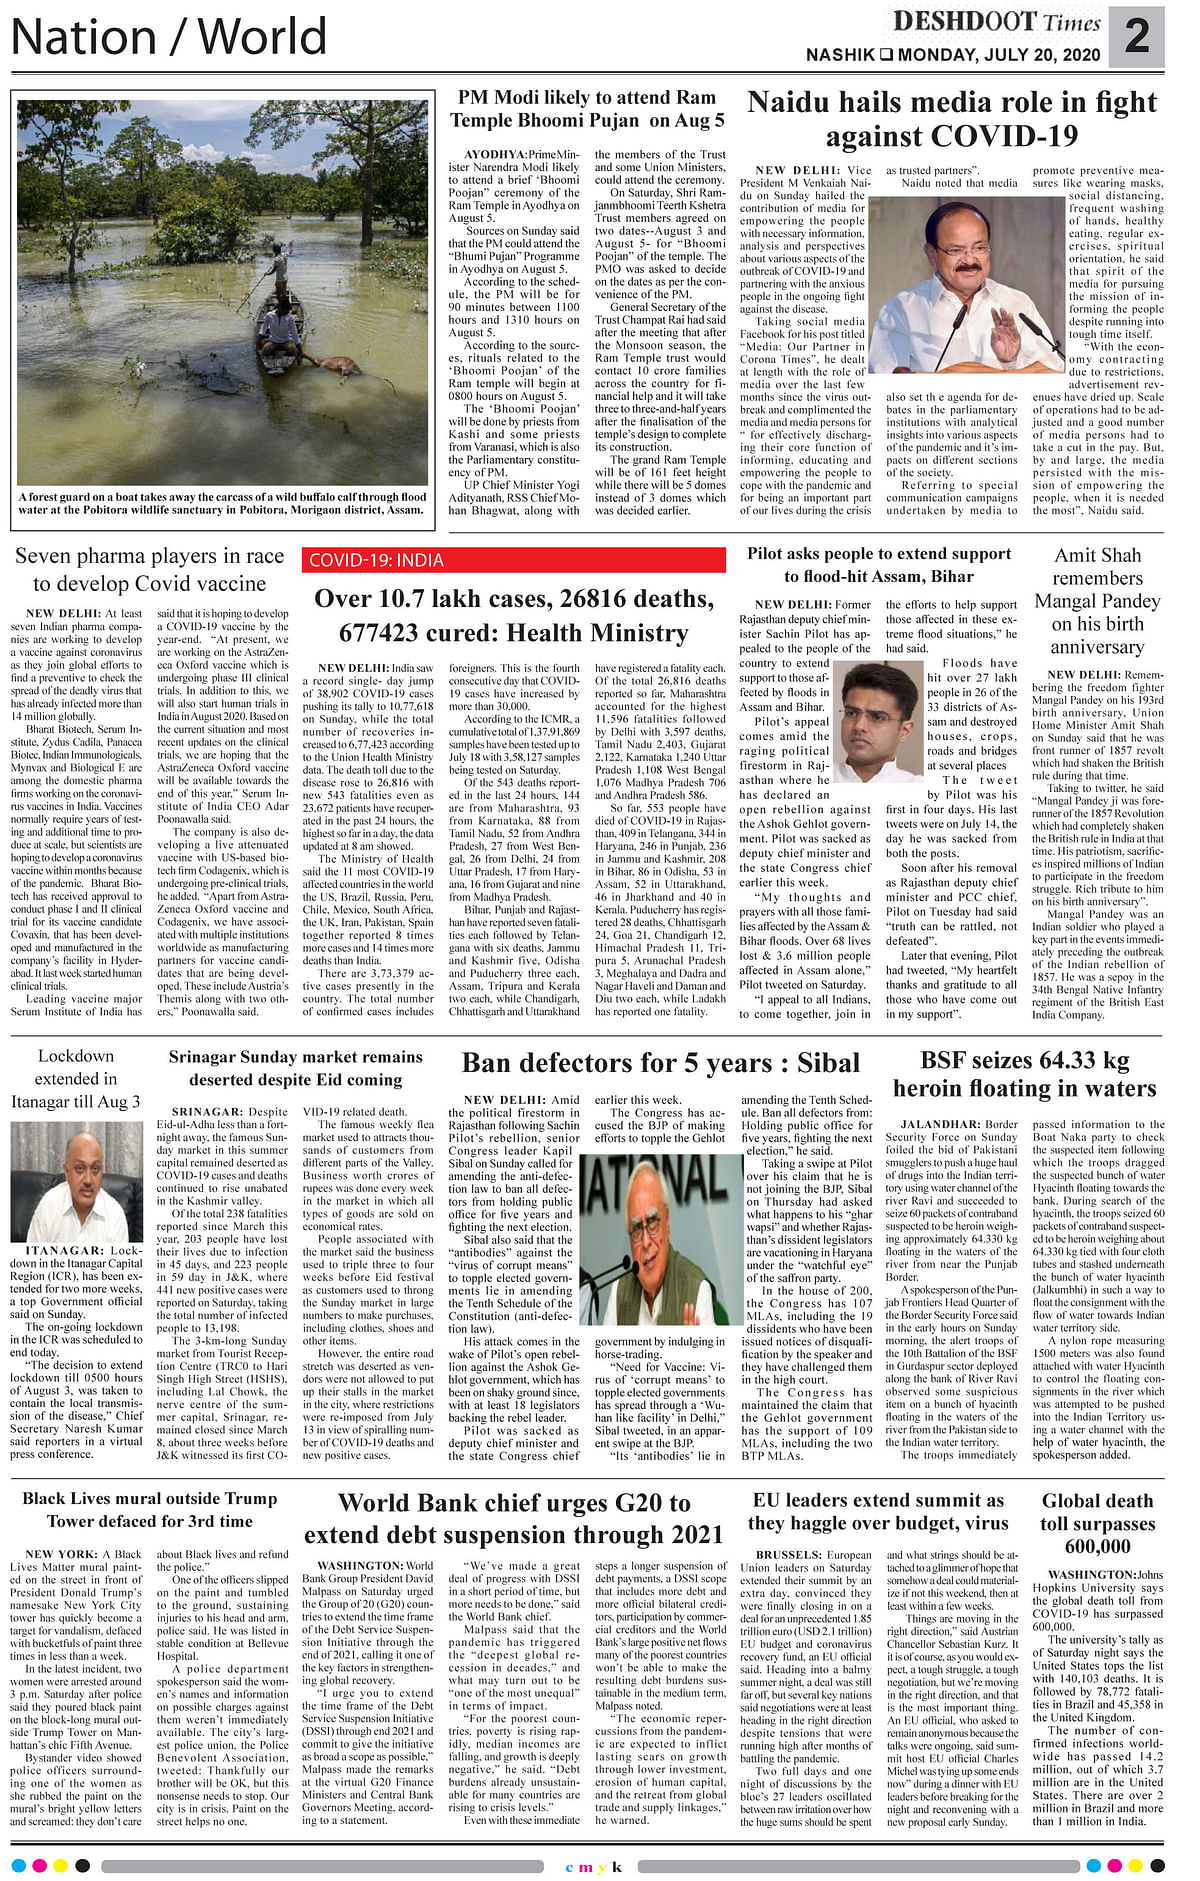 Deshdoot Times E Paper, 20 July 2020